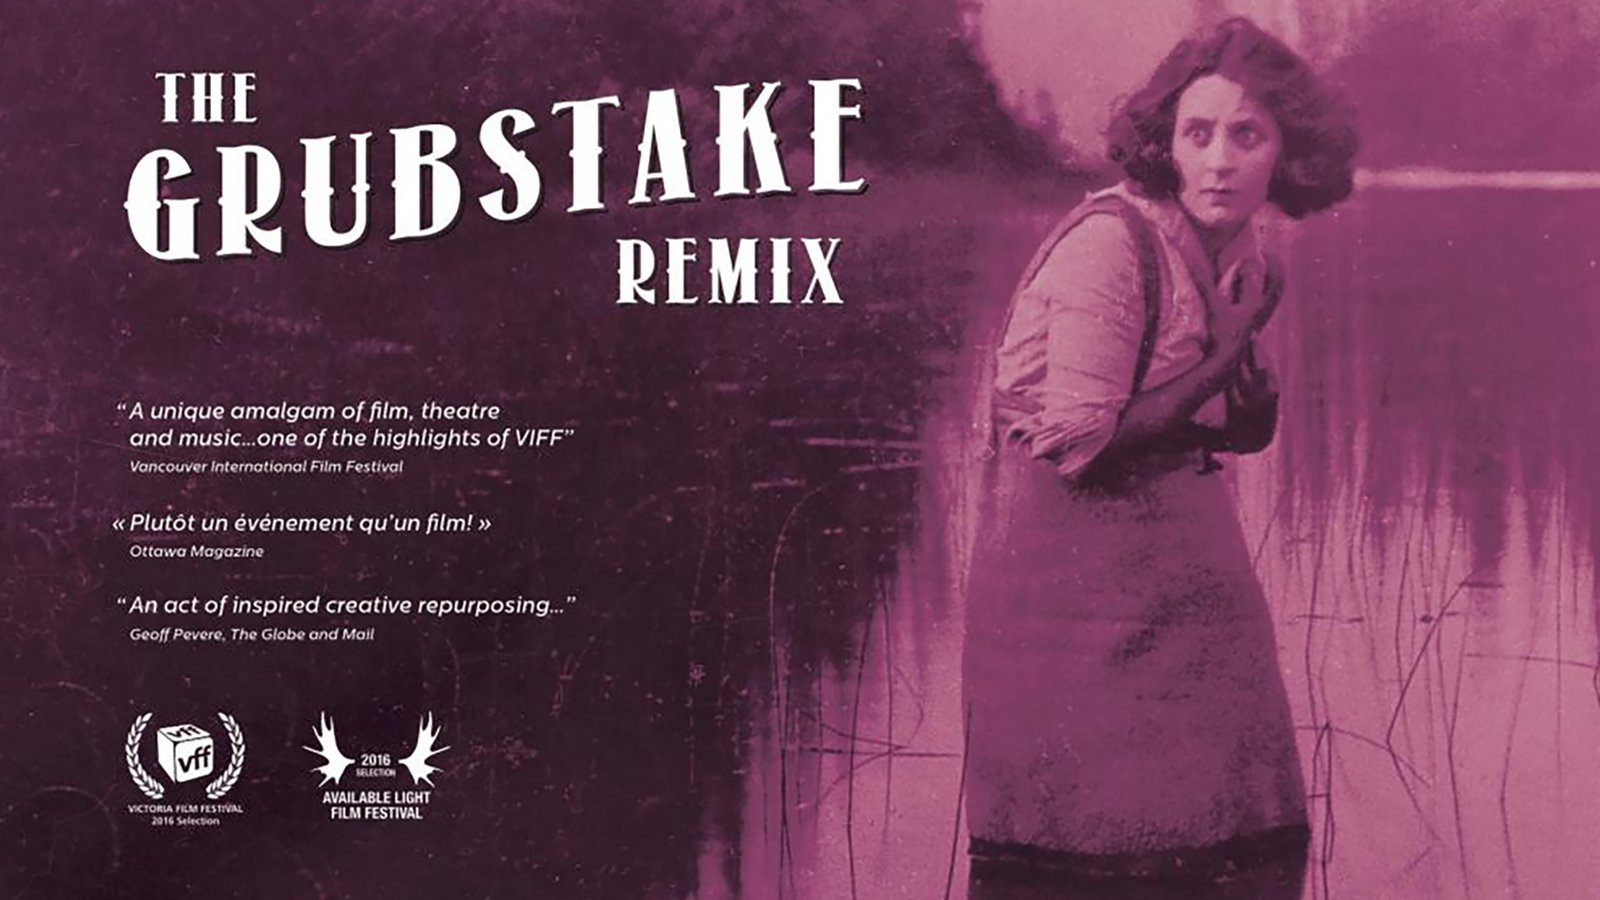 The Grubstake Remix